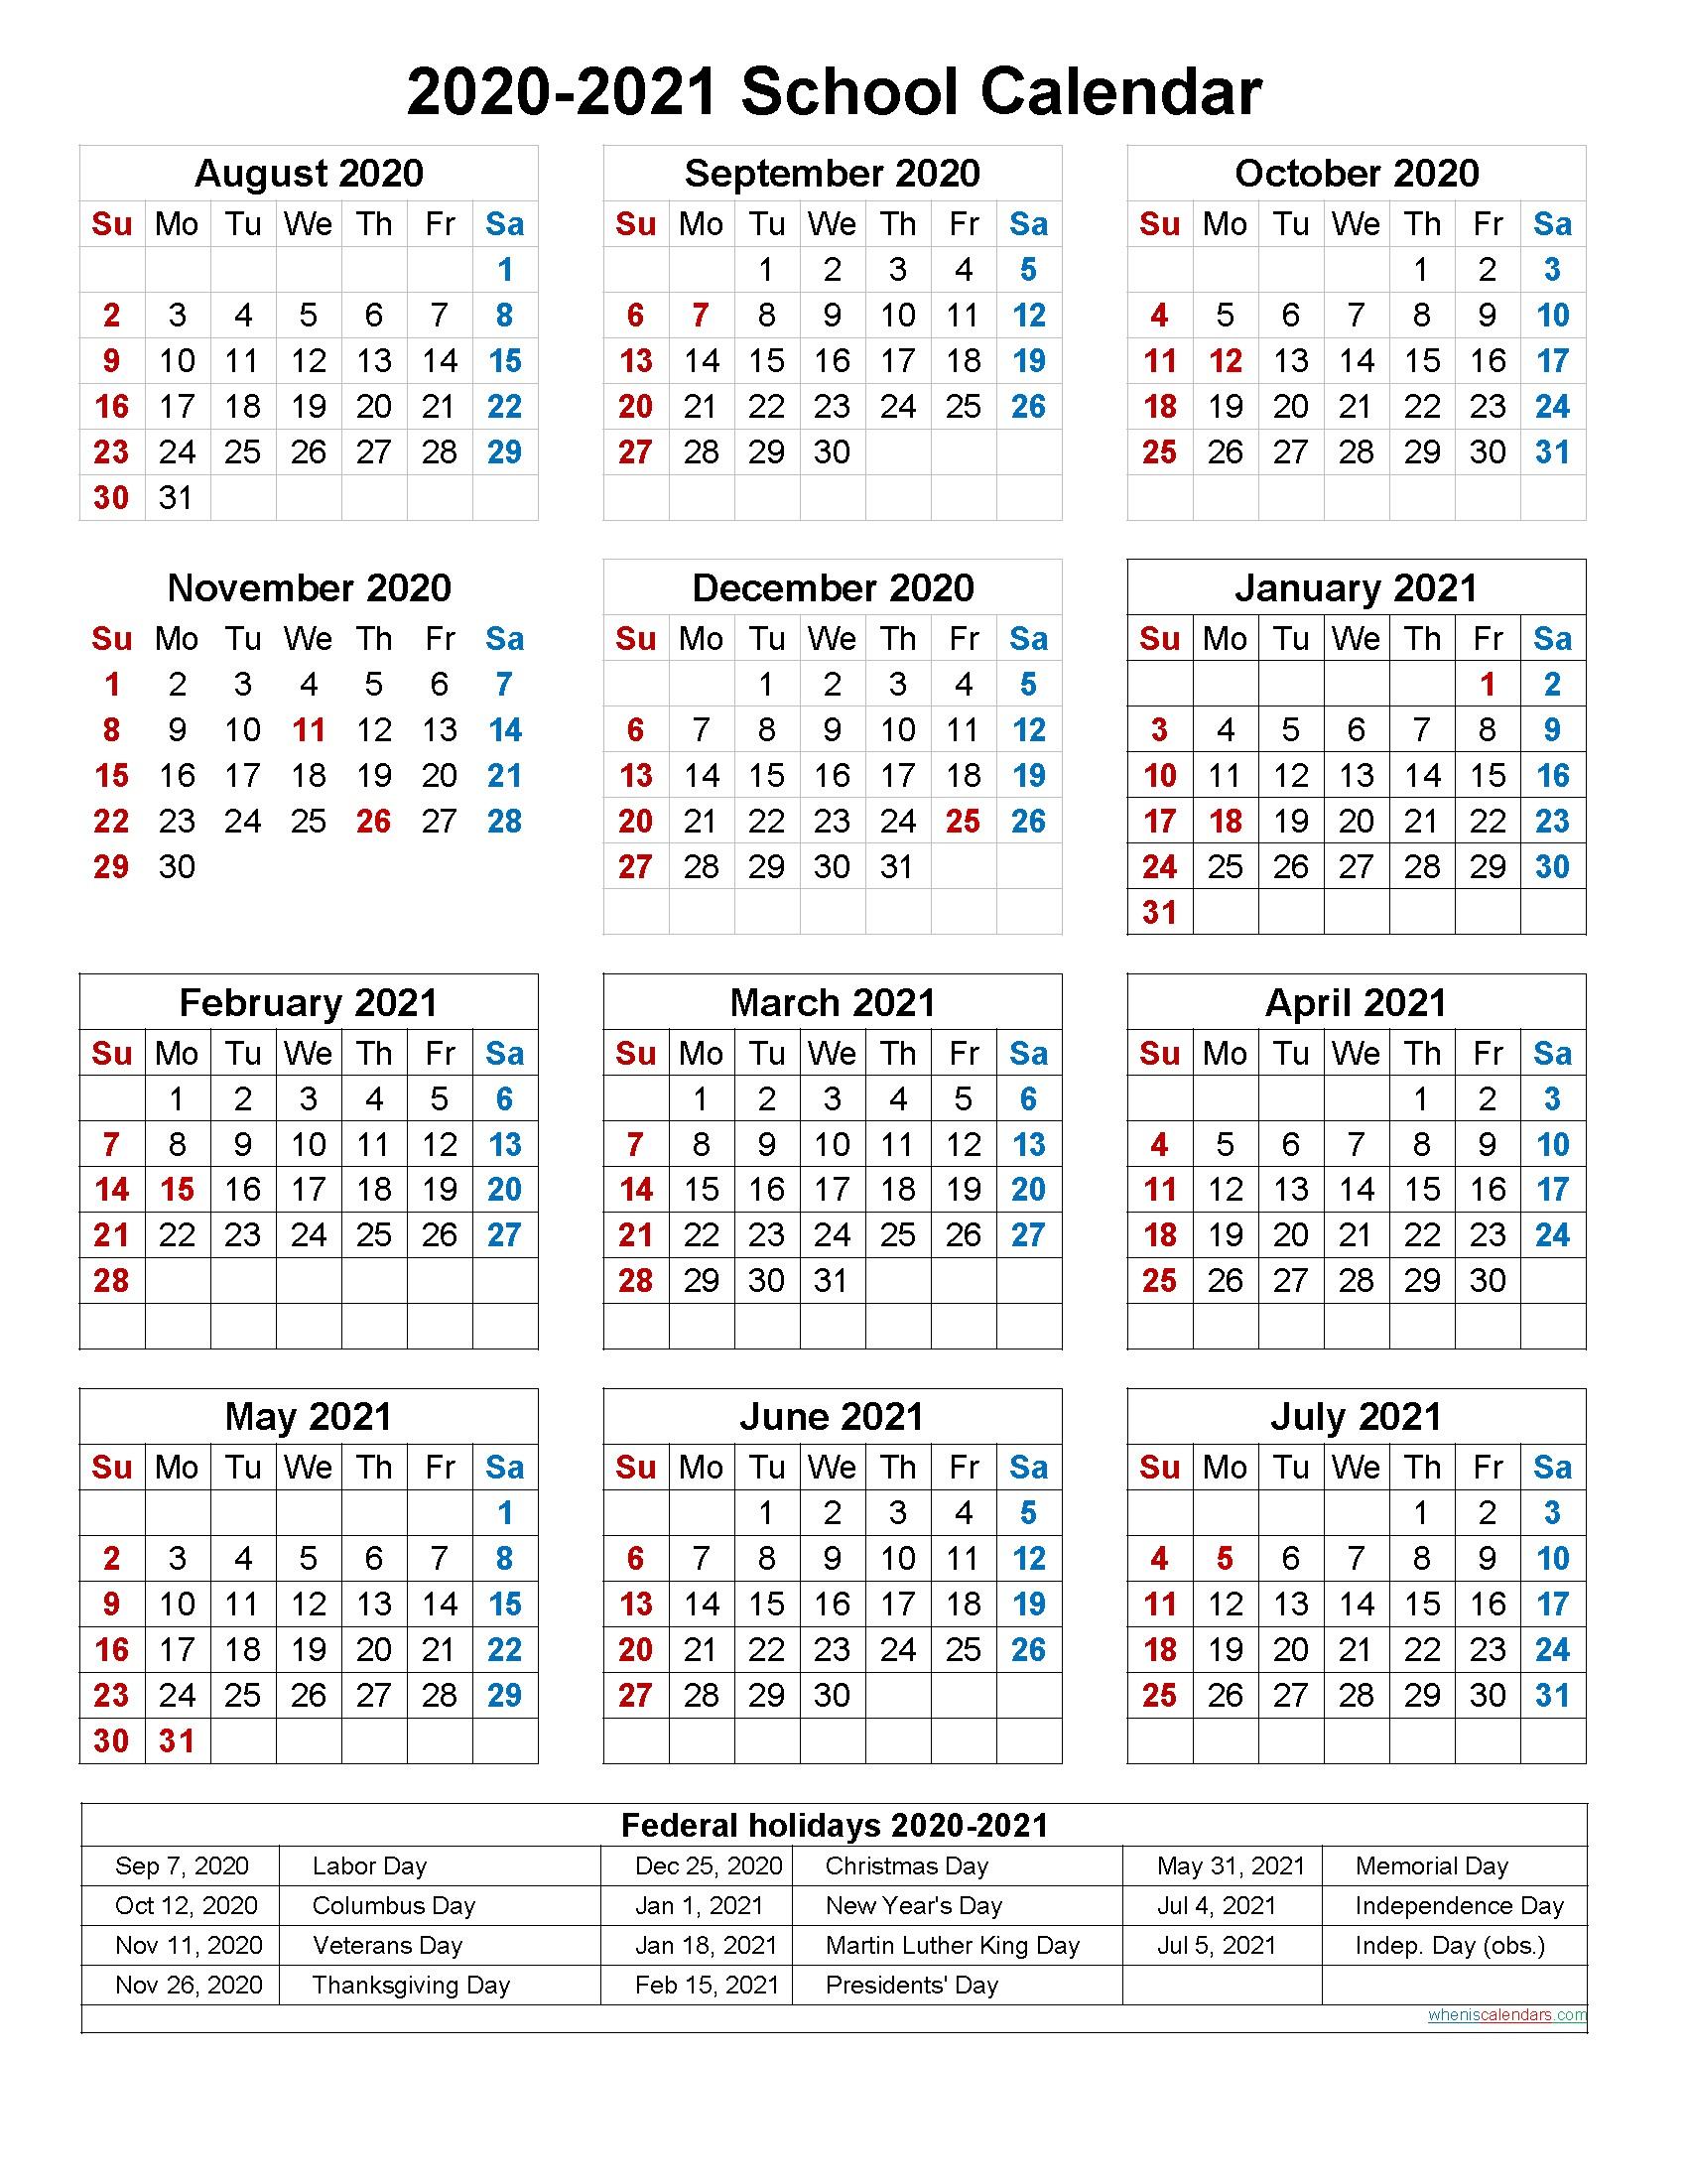 005 Dreaded School Year Calendar Template Image  Excel 2019-20 WordFull